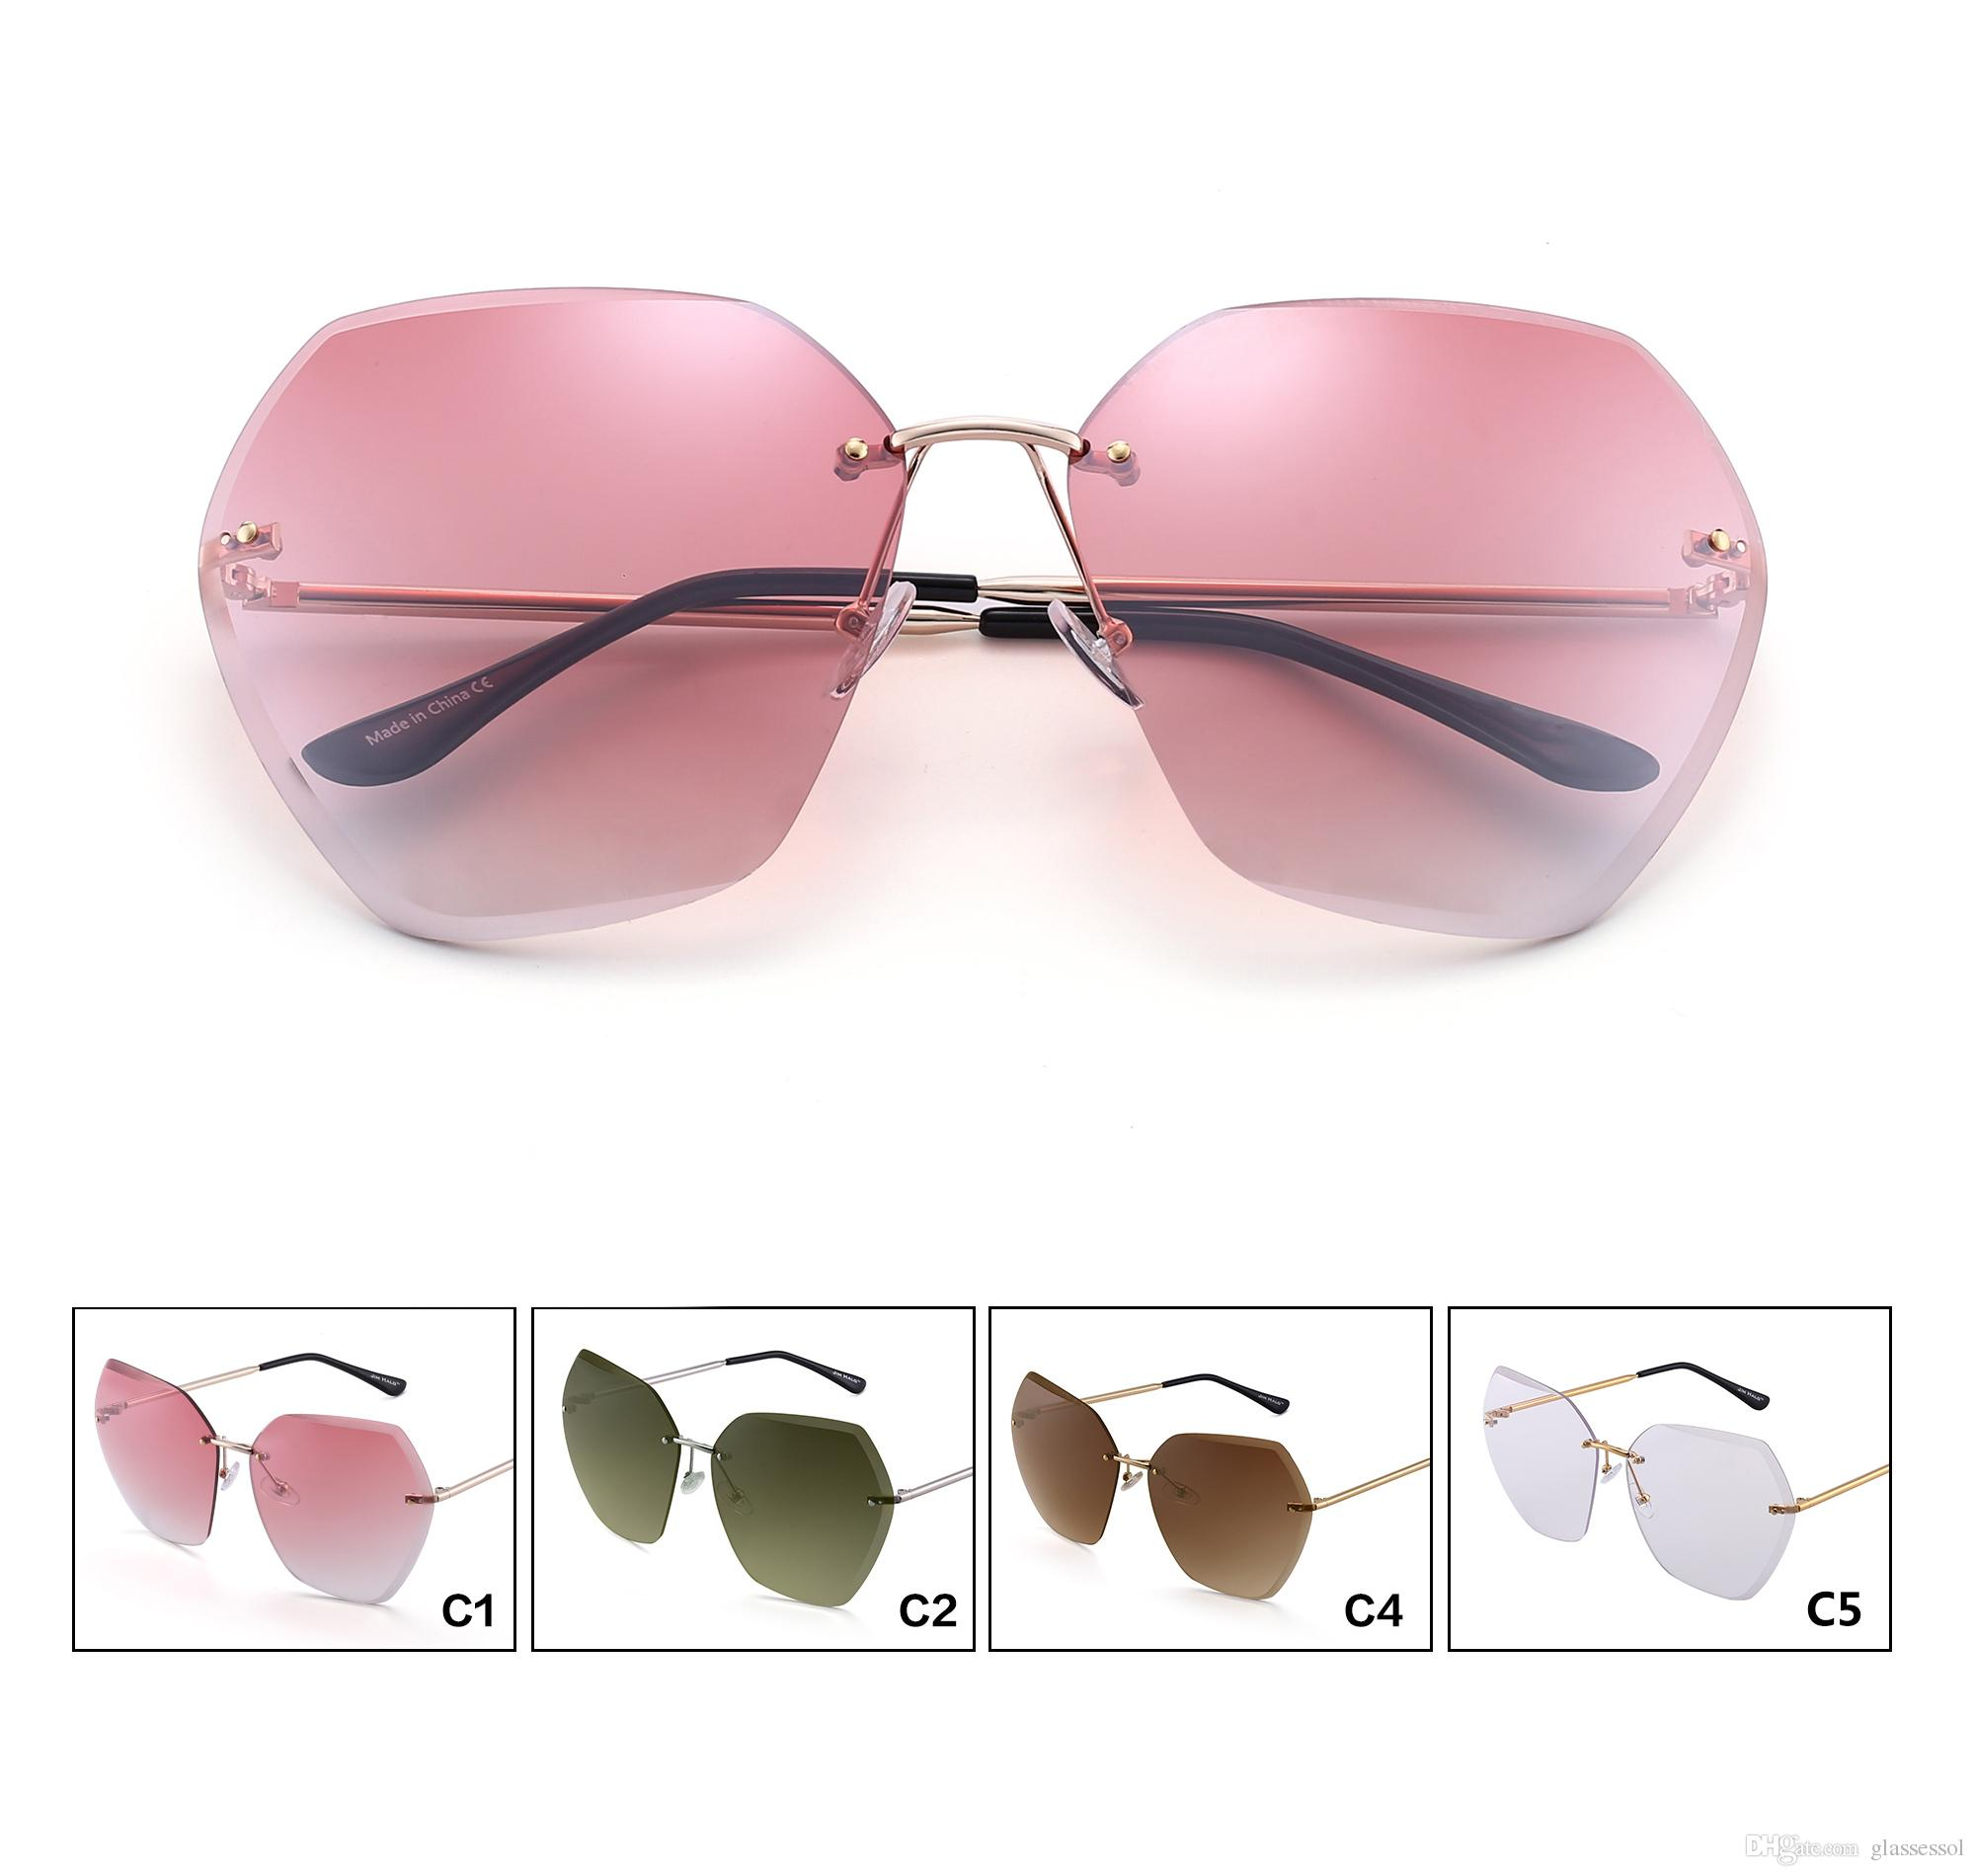 03e016a6f6 2019 Fashion Sexy Rimless Oversized UV400 Sunglasses For Women Metal Frame  Sun Glasses Pink Blue Plastic UV400 Shades Design Prescription Sunglasses  Online ...